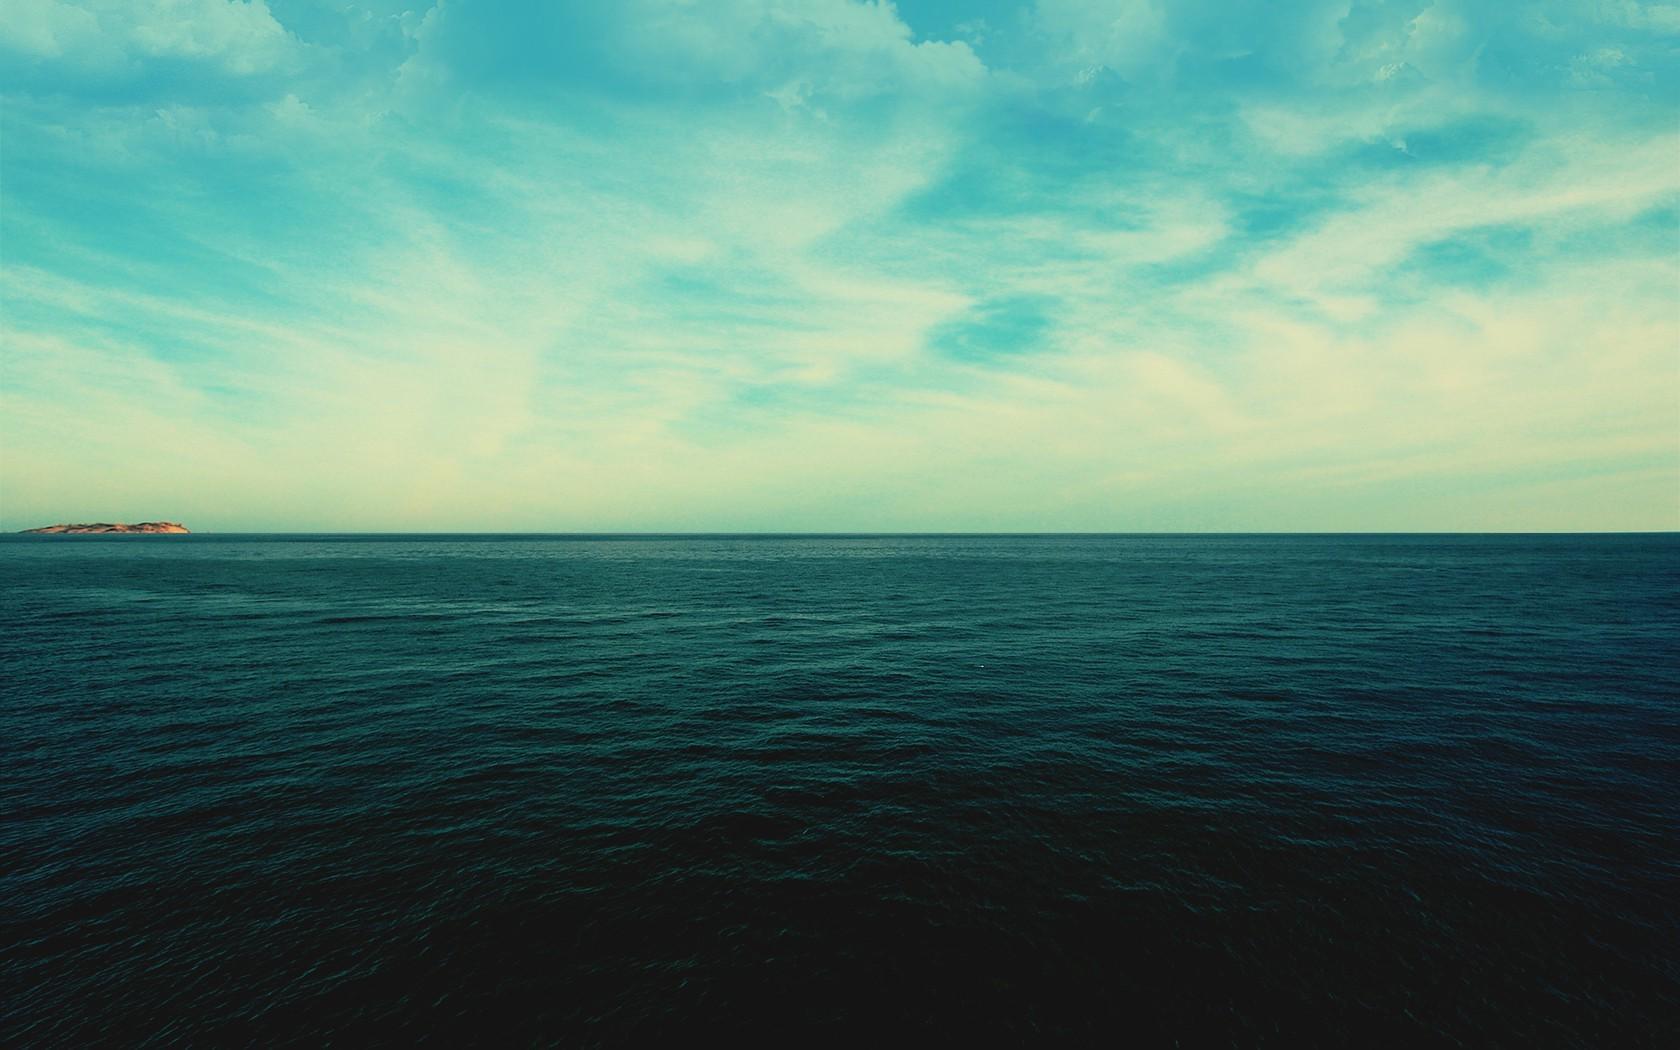 sea pictures wallpaper,sky,horizon,body of water,sea,blue